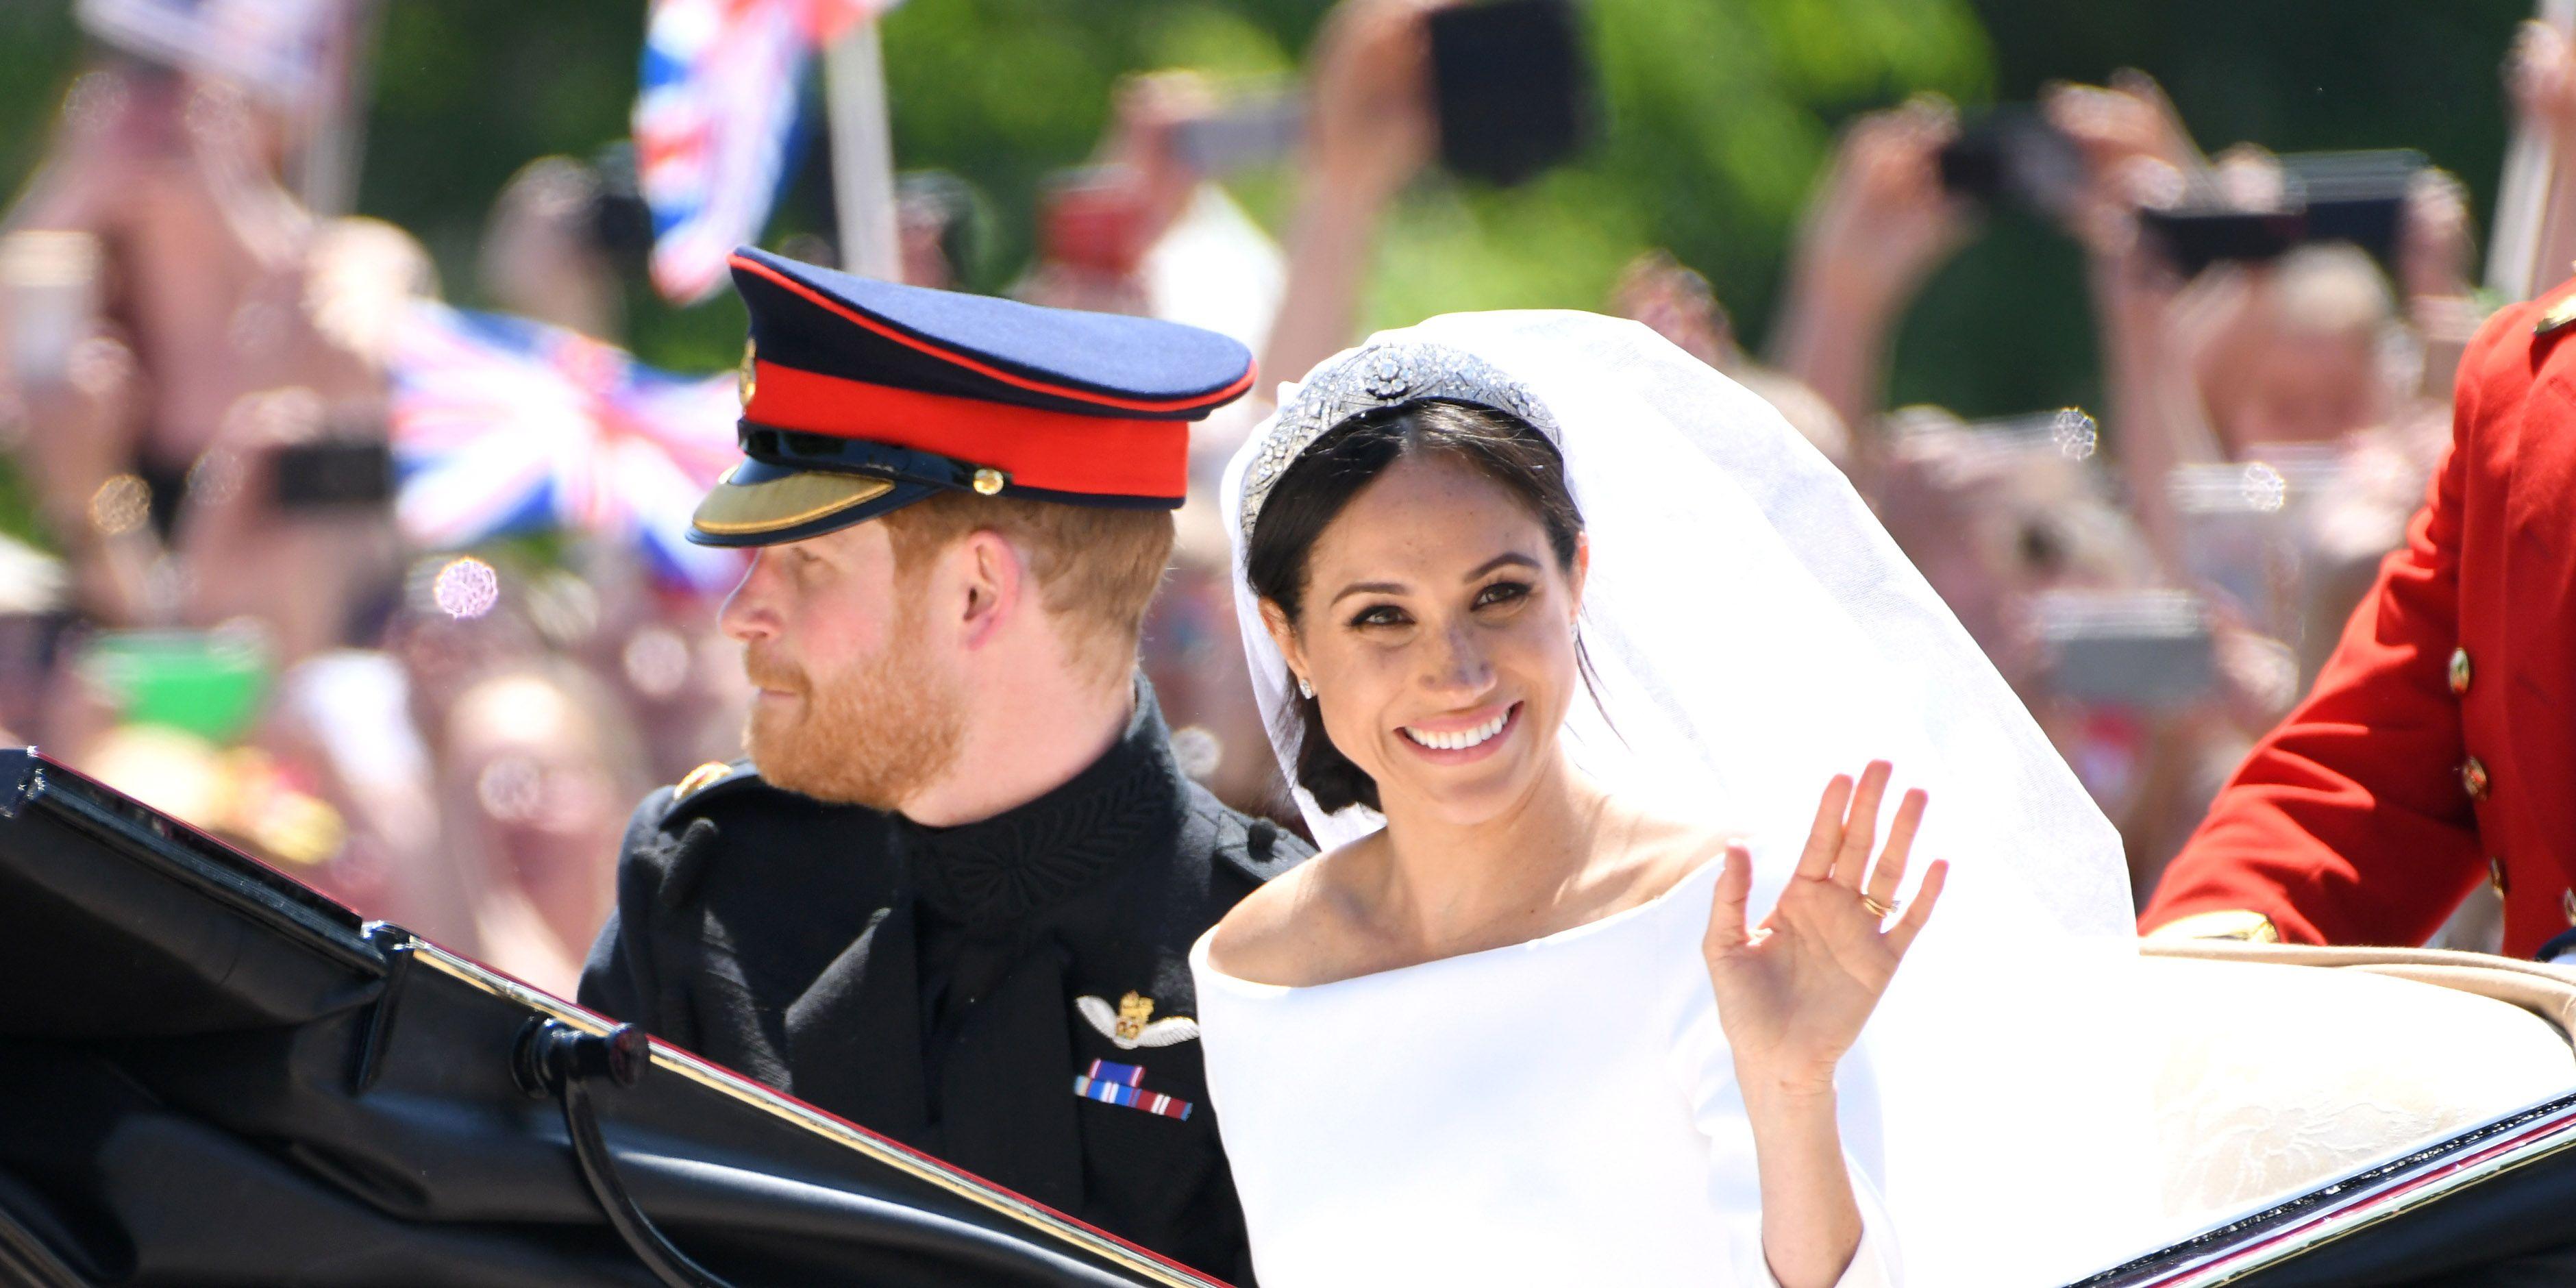 Prince Harry Meghan Markle Duke Duchess Sussex Royal Wedding wave